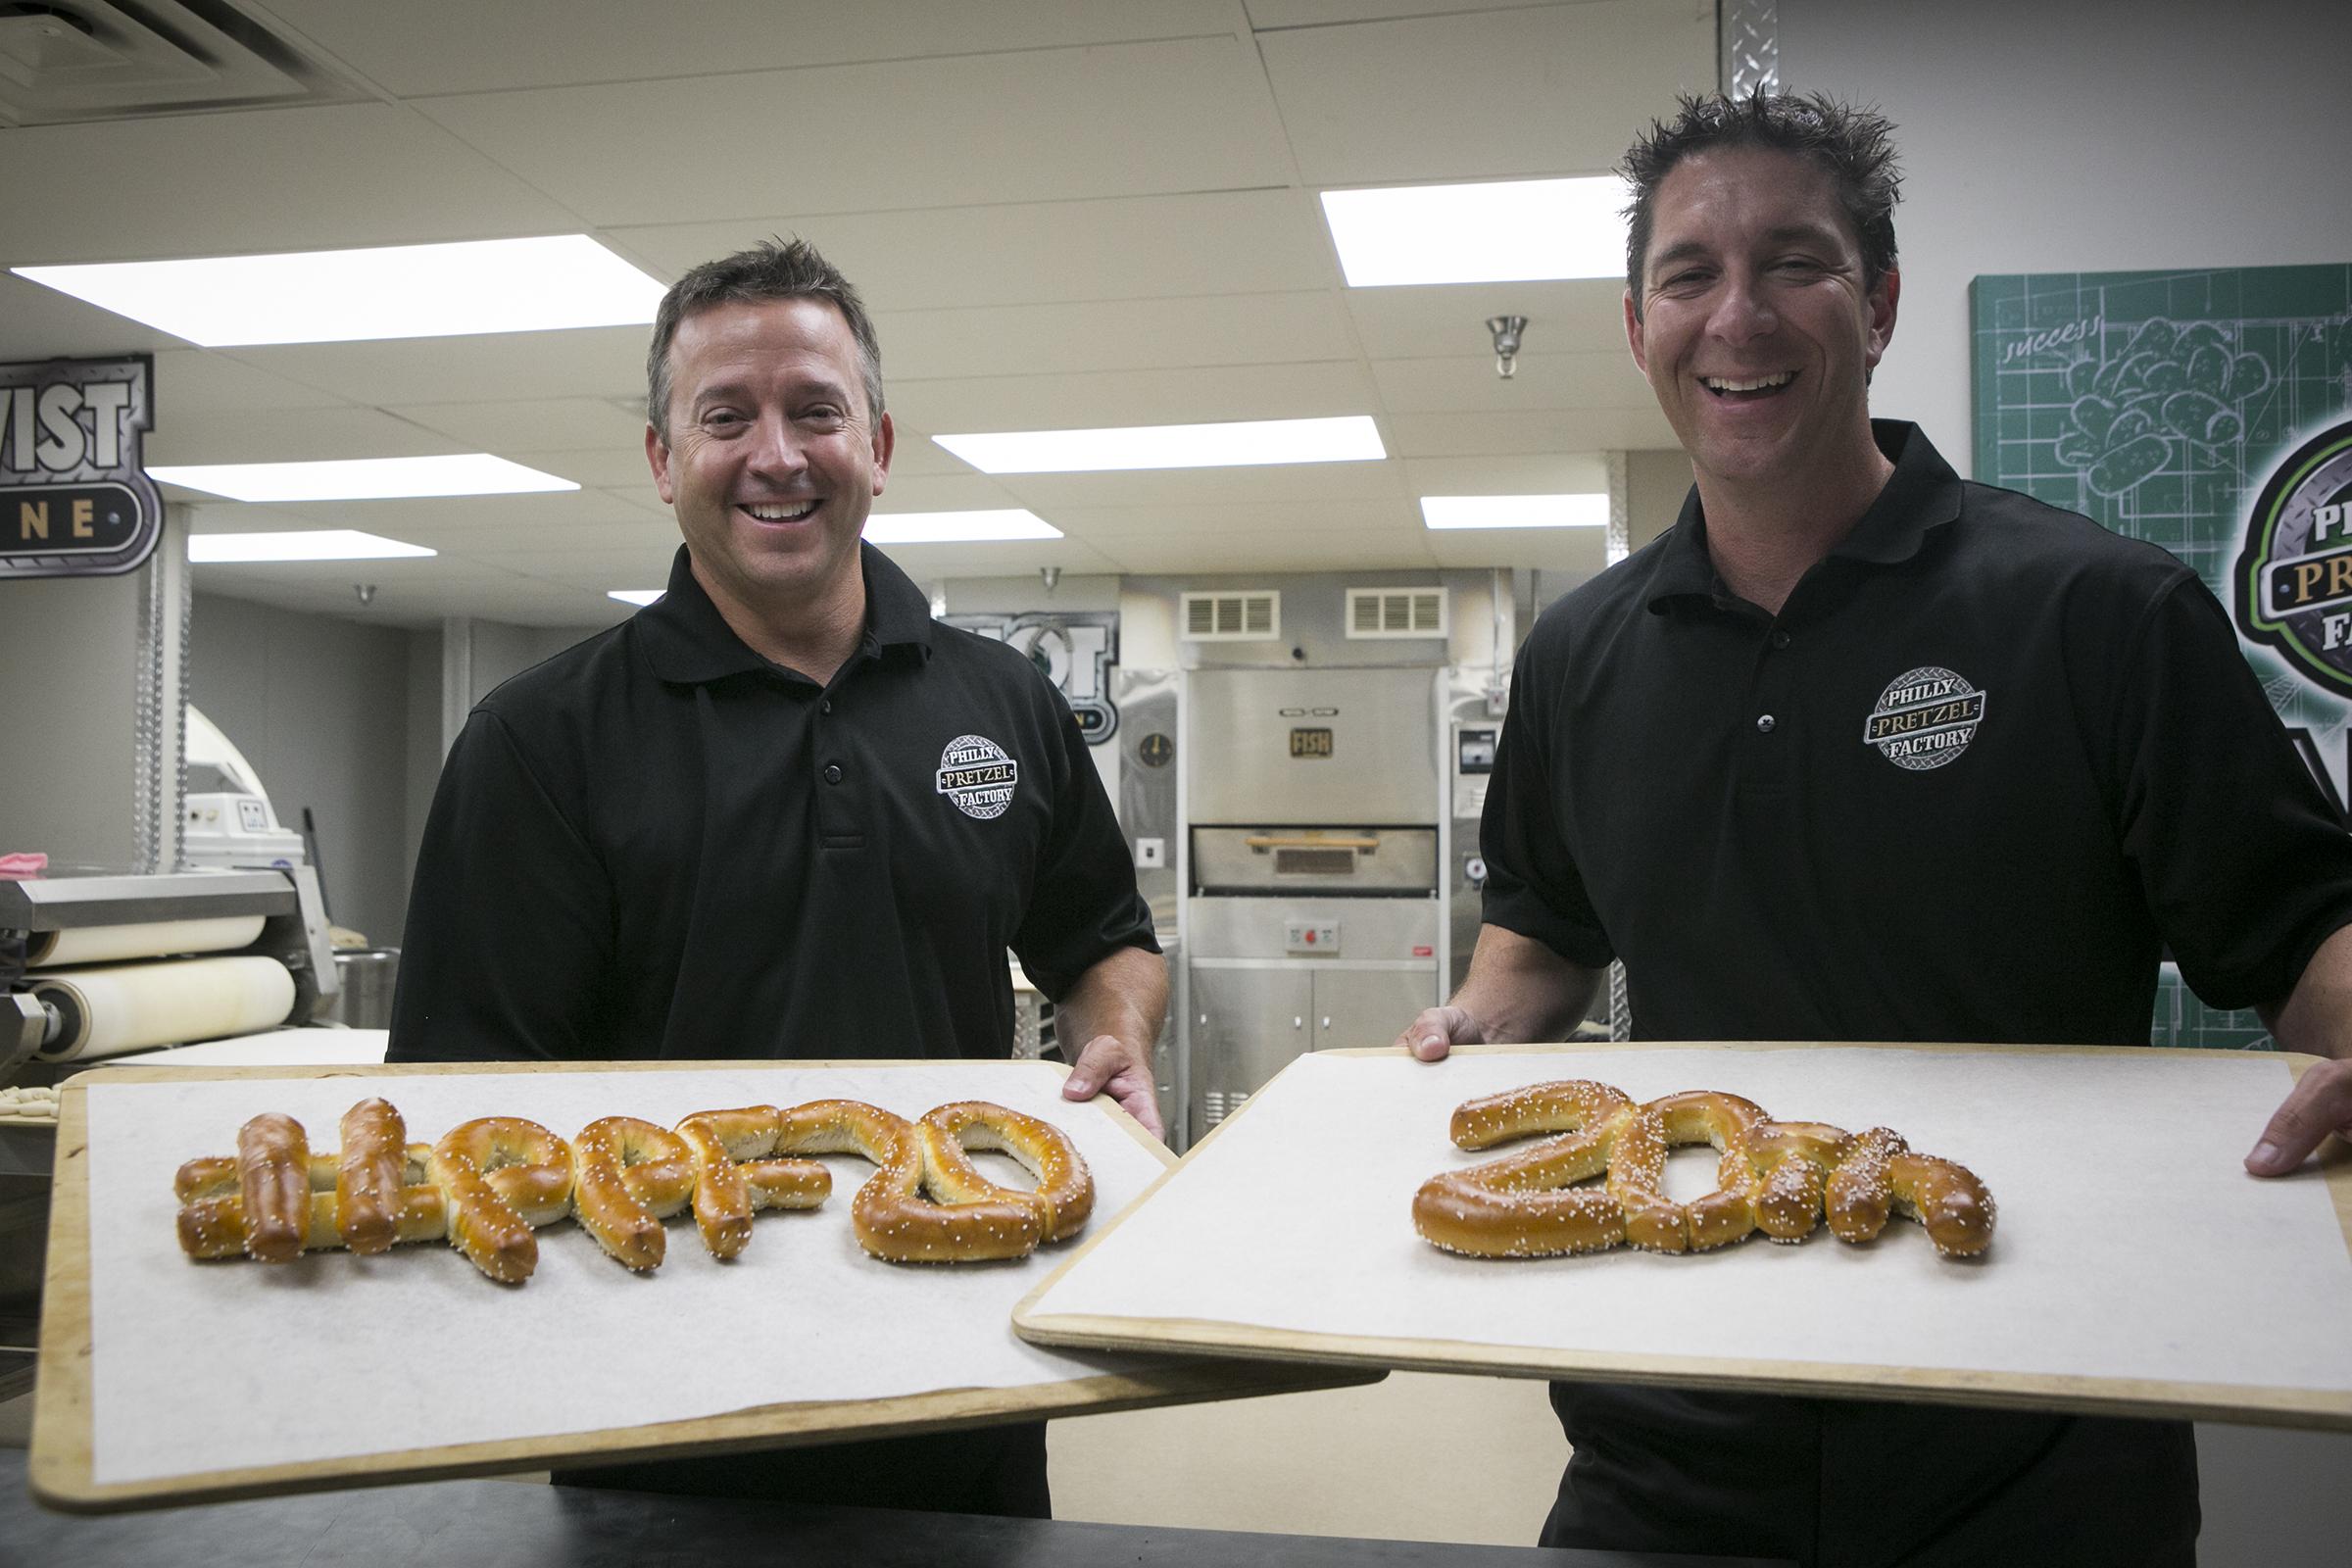 Philly Pretzel Factory co-founders Len Lehman (left) and Dan DiZio with celebratory pretzels in the test kitchen at Philly Pretzel Factory headquarters in Bensalem, Pa.